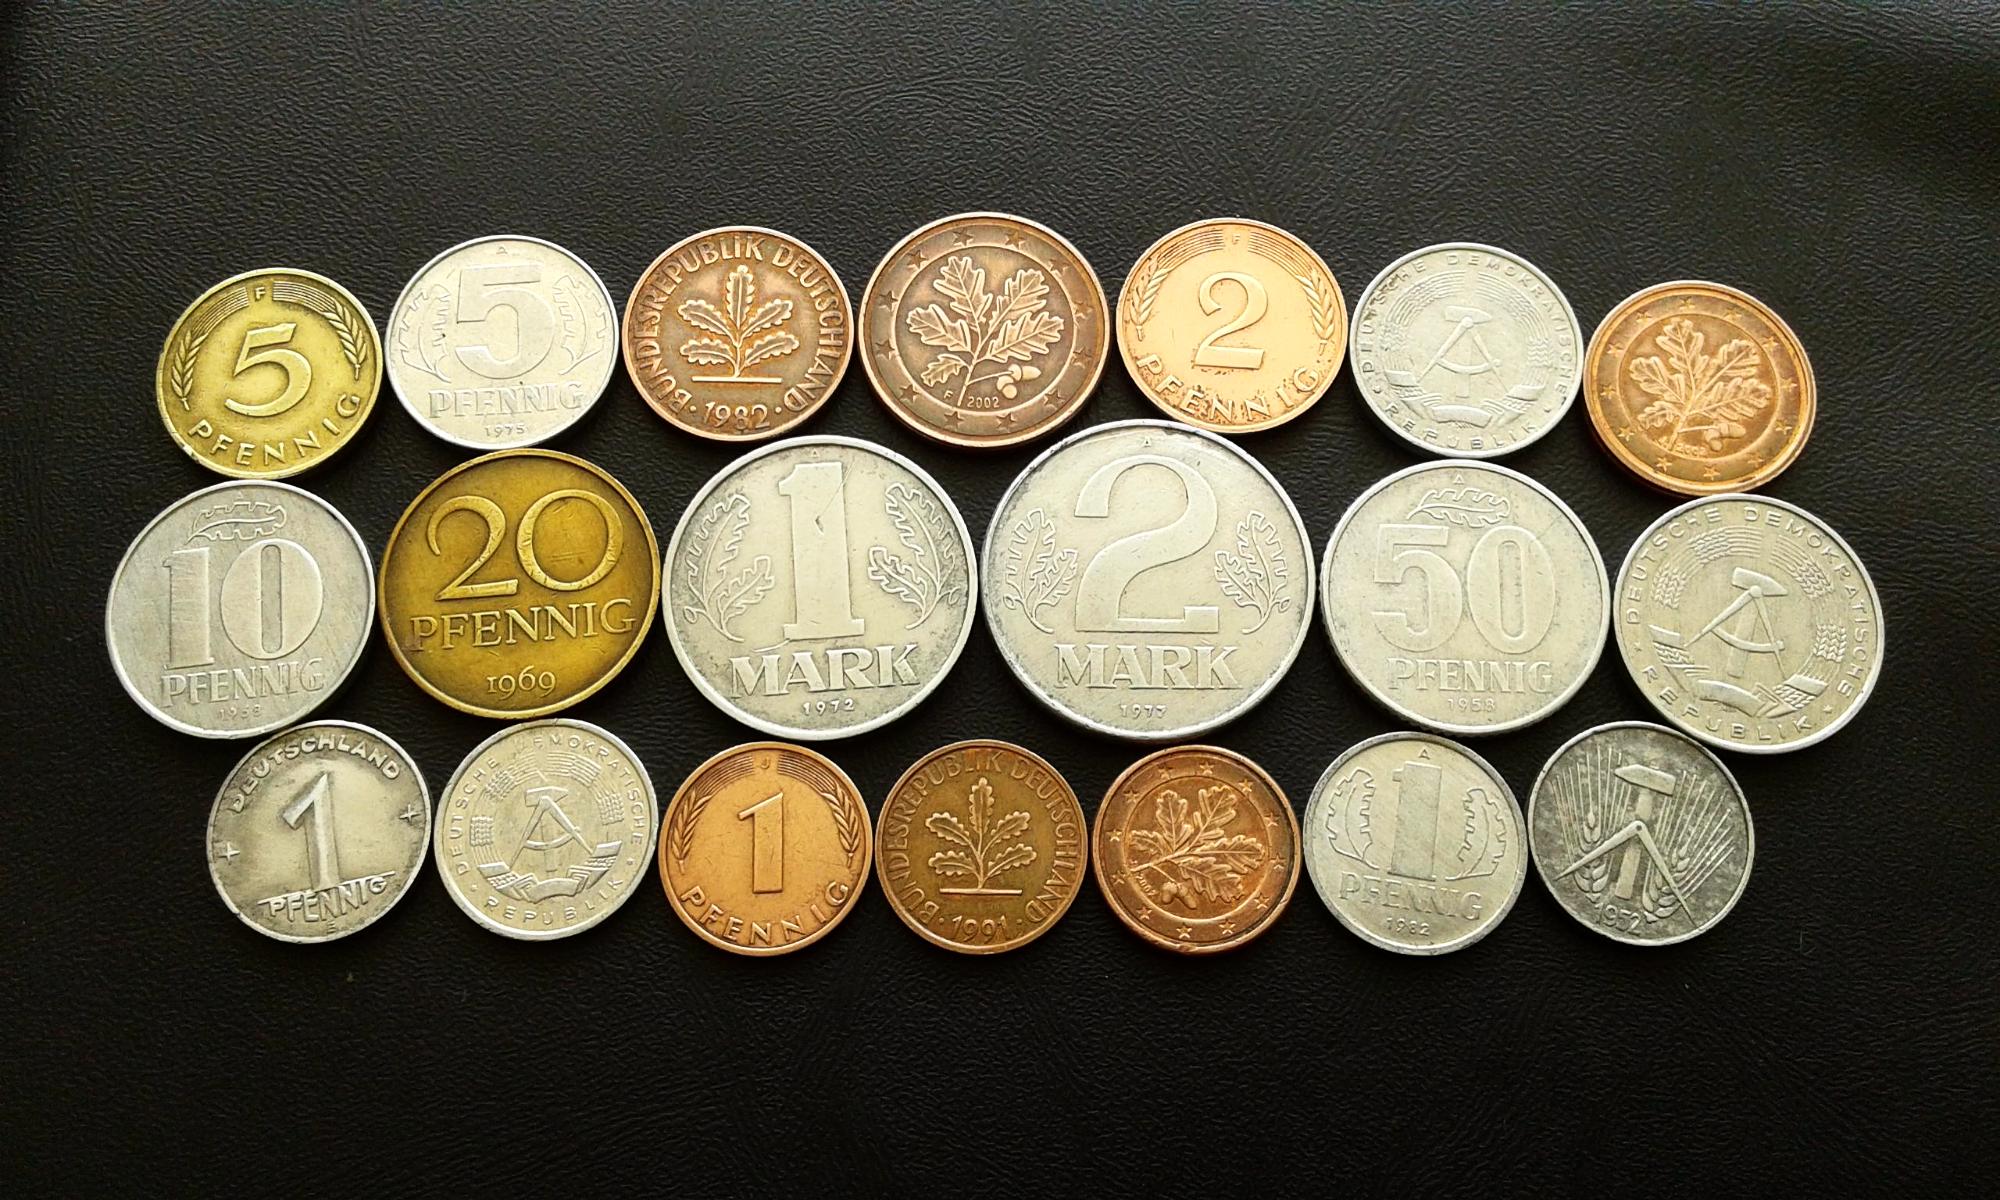 Скупка монет, продажа монет — Каталог монет СССР, Фото и ...